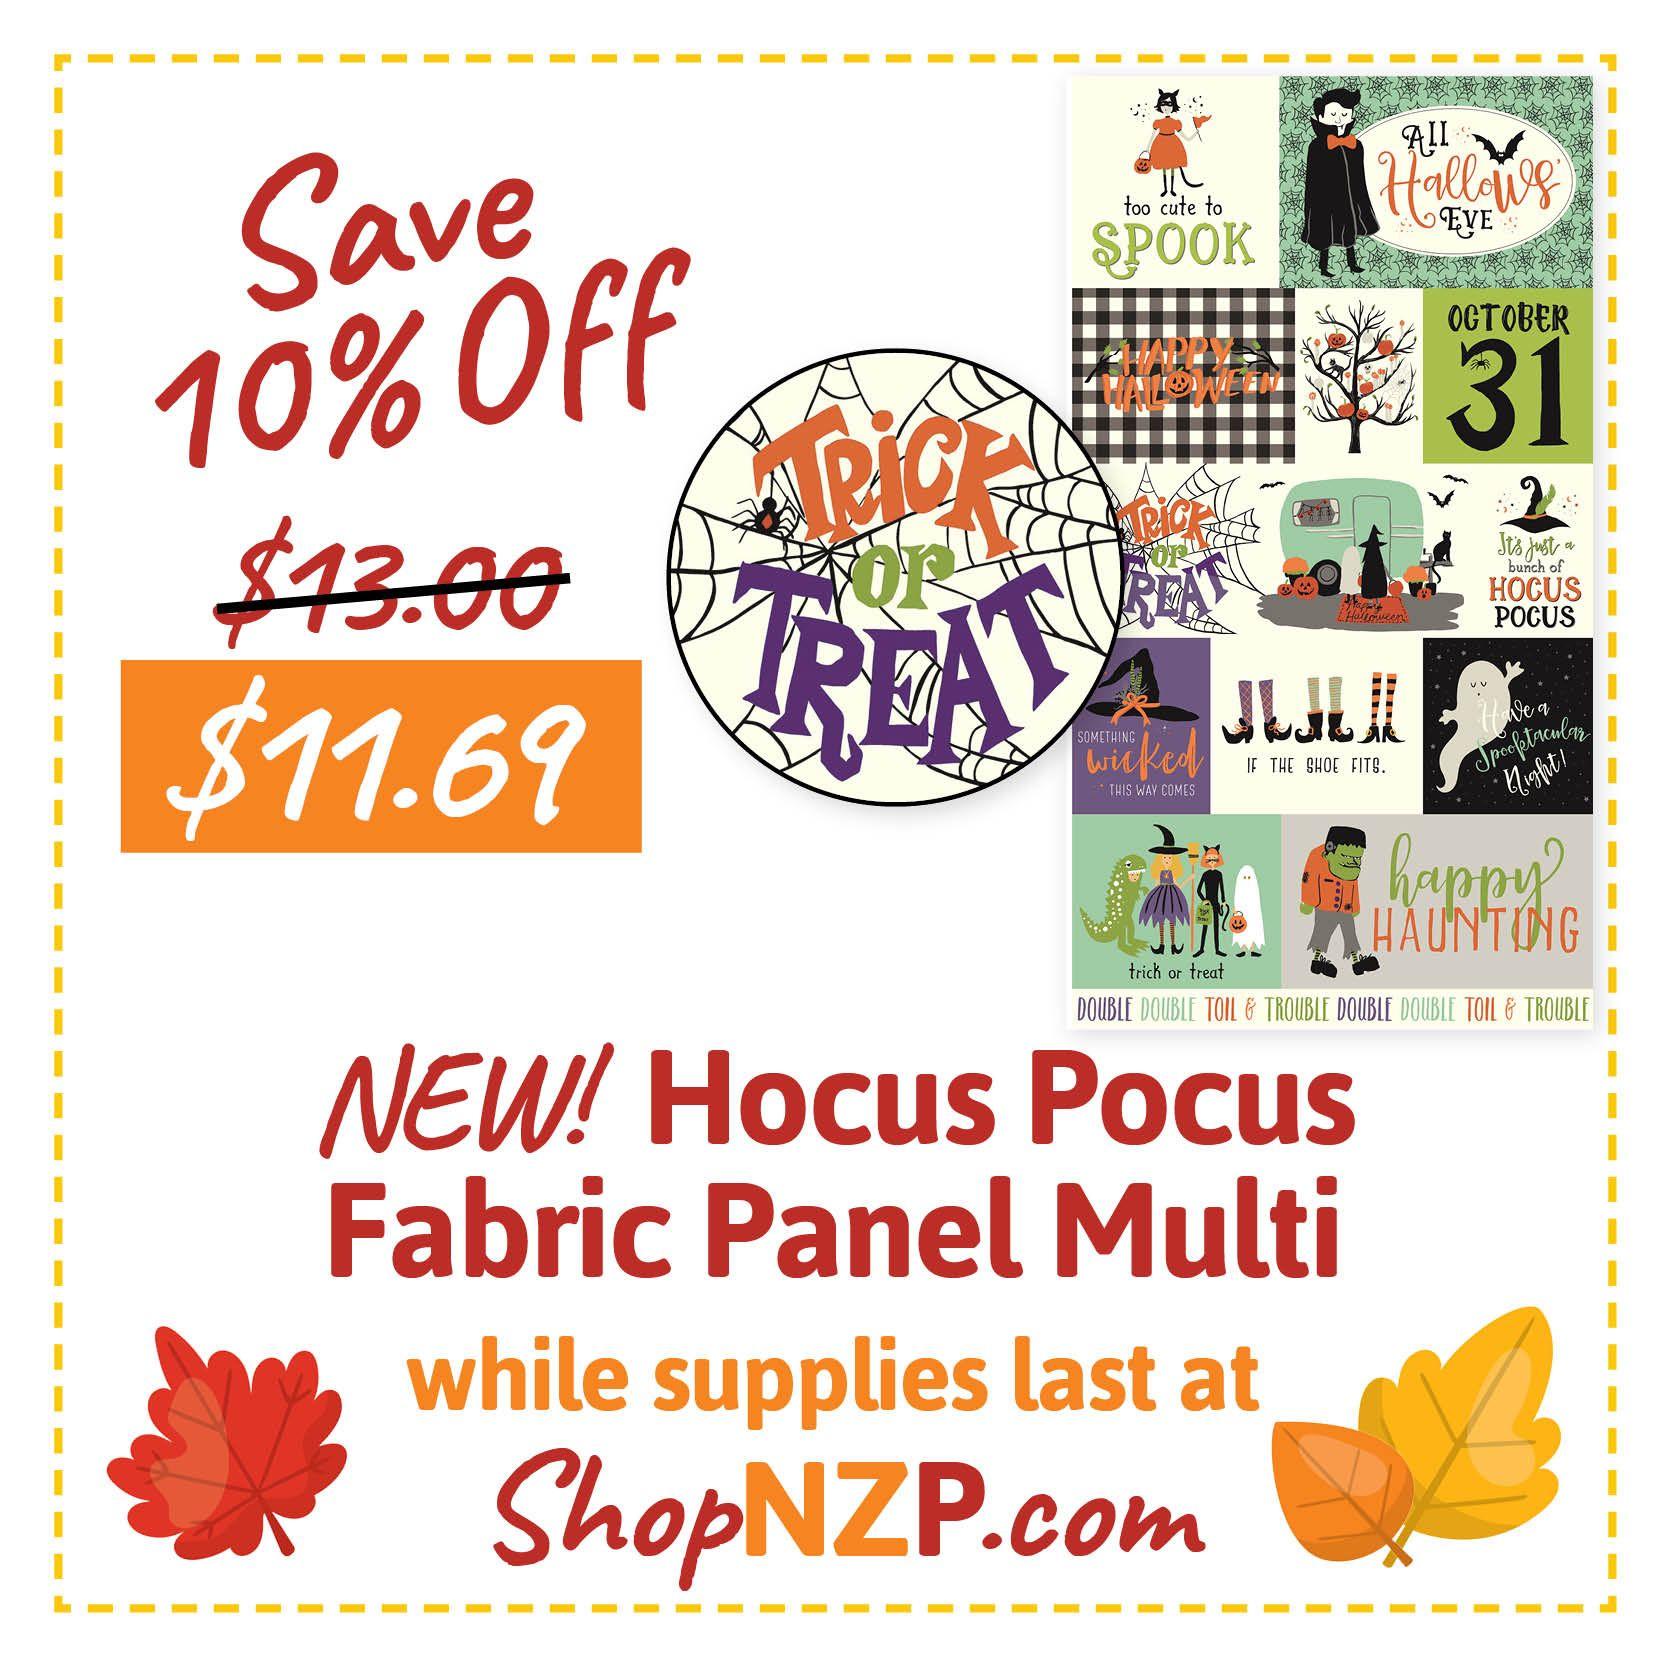 Halloween Nzp 2020 SAVE 10% Off NEW! Halloween Hocus Pocus Fabric Panels  While